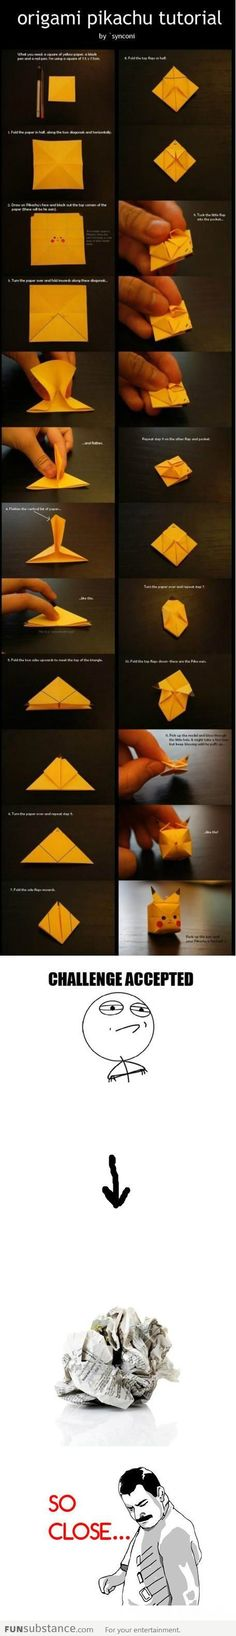 Origami pikachu tutorial